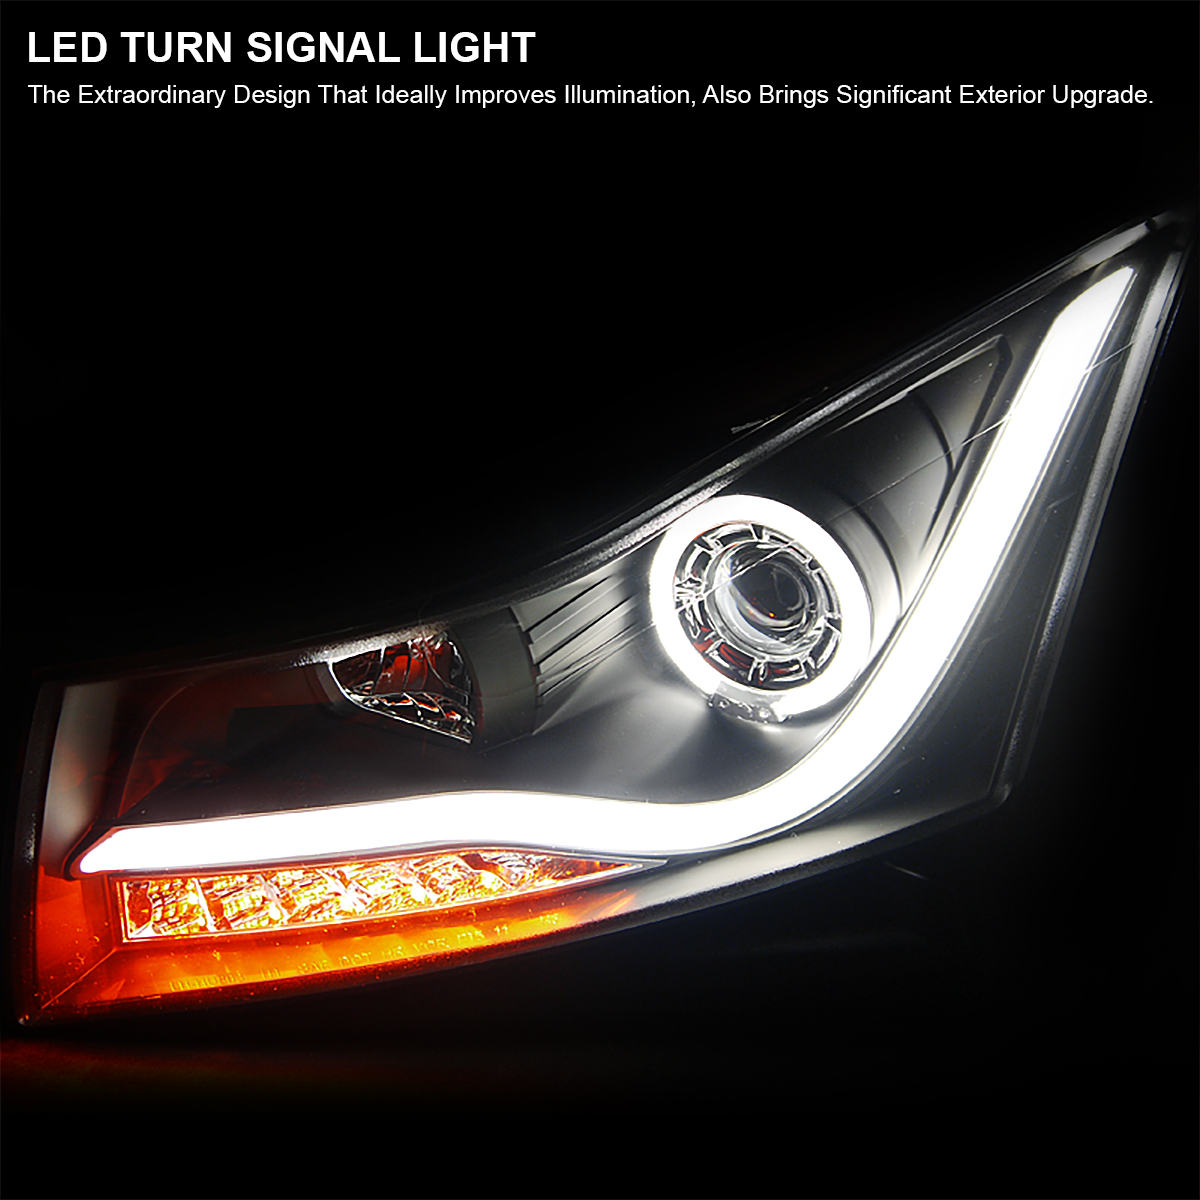 Spyder 2010-2014 Chevy Cruze PHILIPS-LED Light Tube ...  |2014 Chevy Cruze Lights